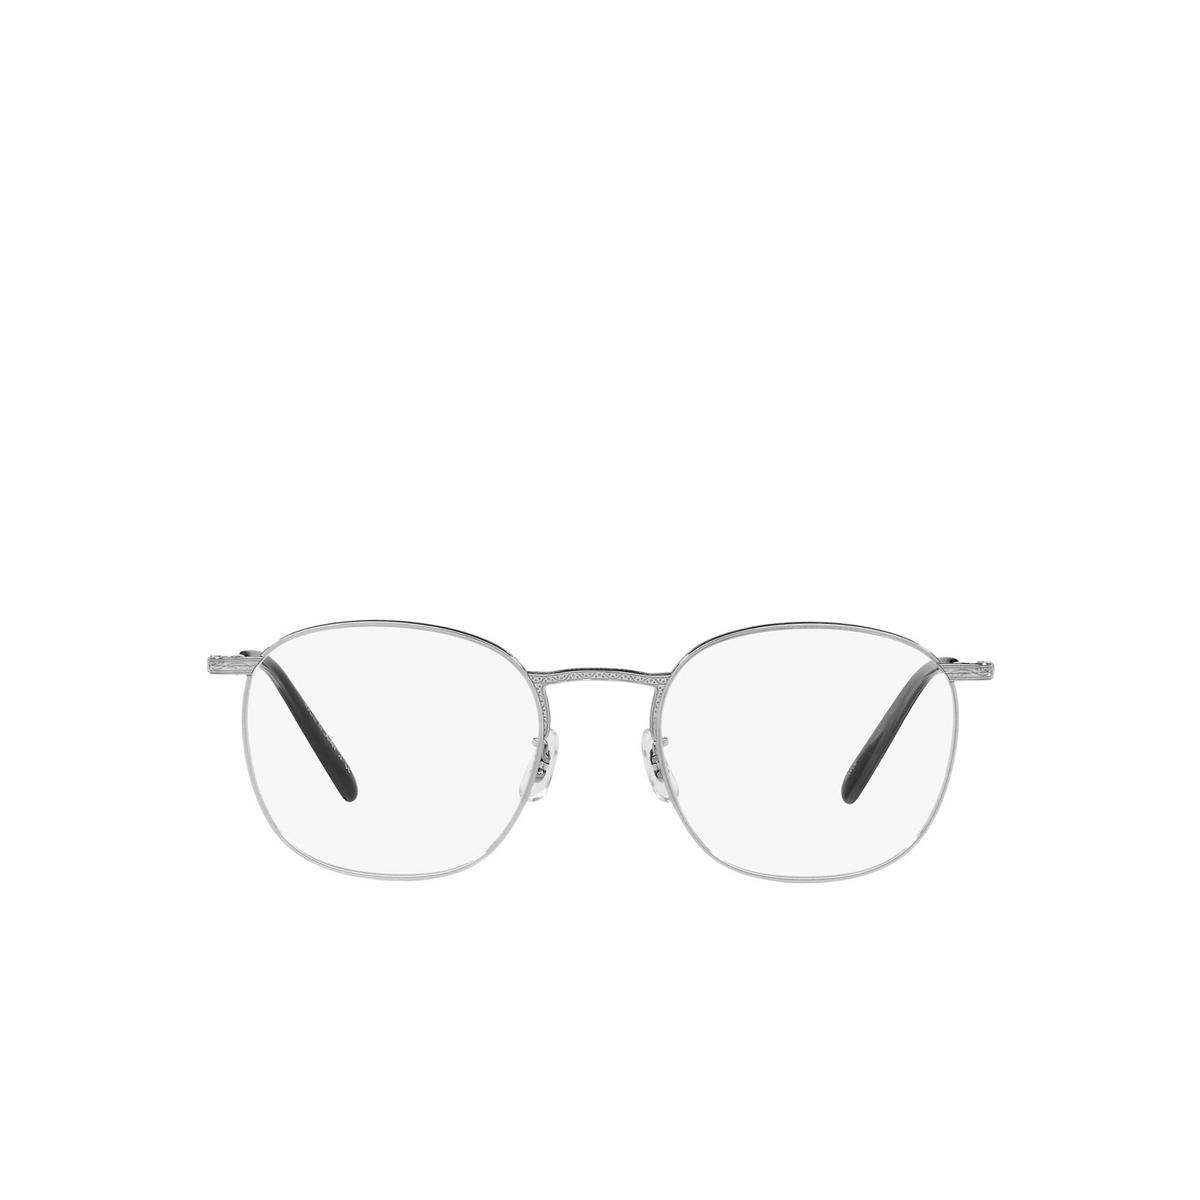 Oliver Peoples® Square Eyeglasses: Goldsen OV1285T color Silver 5036 - front view.